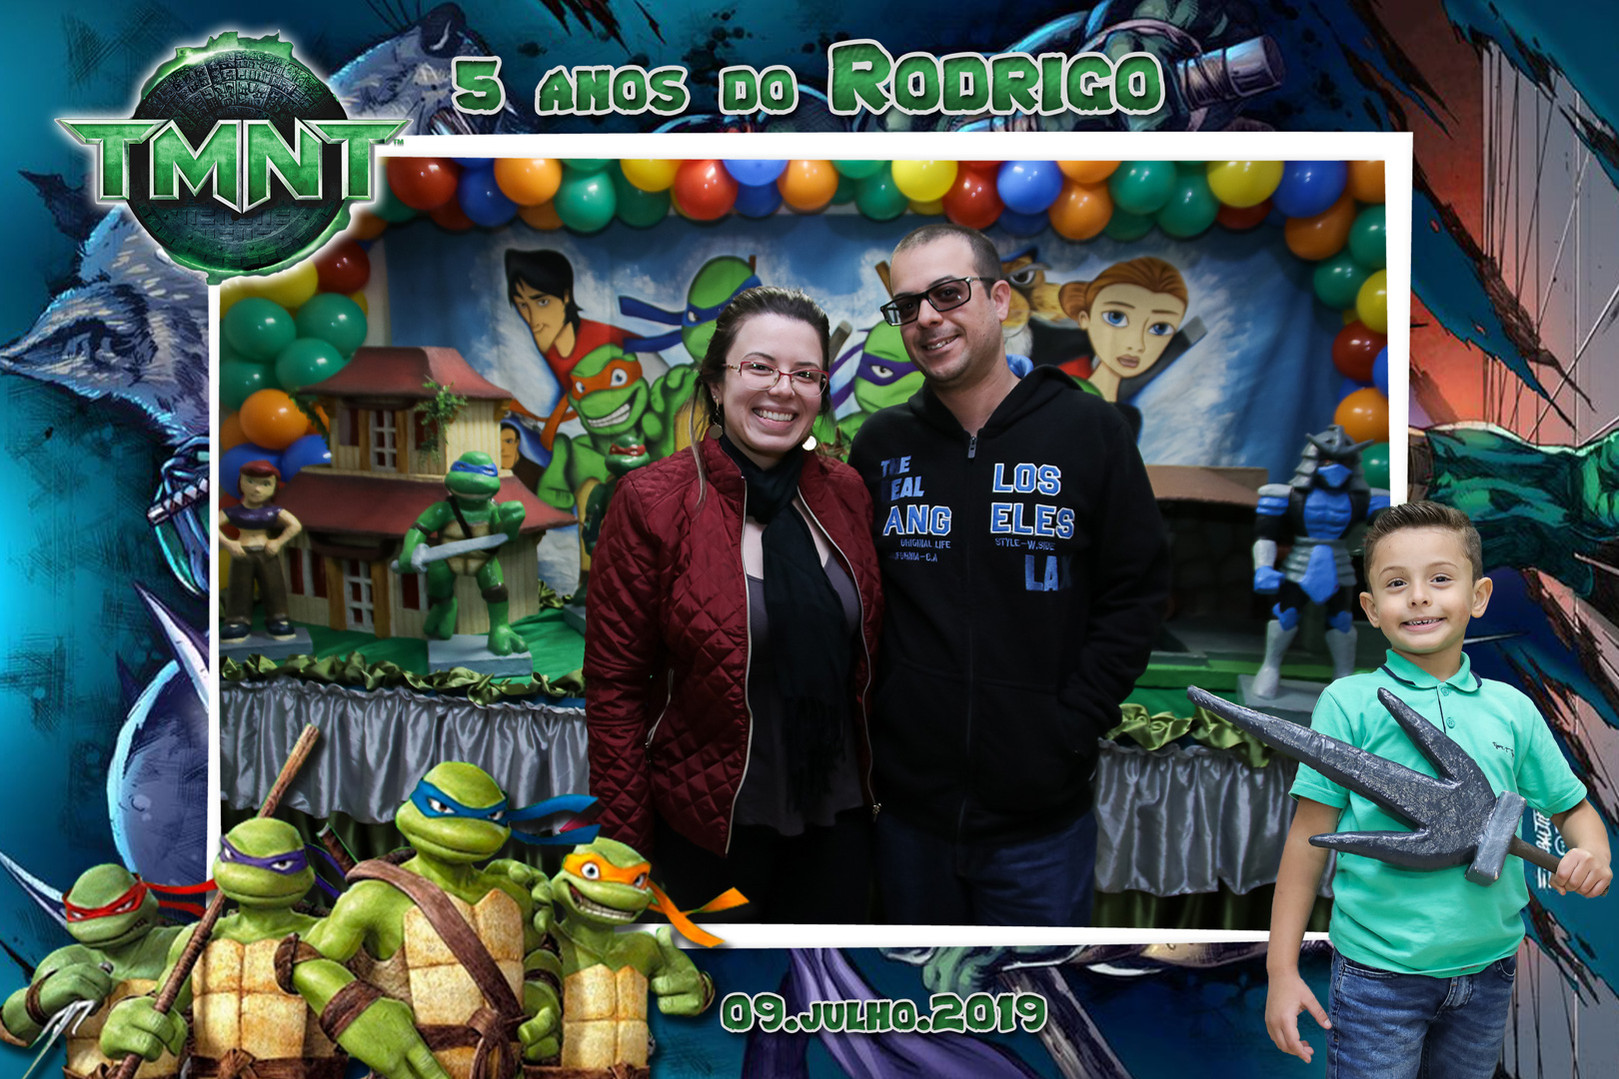 Rodrigo 5 anos (33).jpg